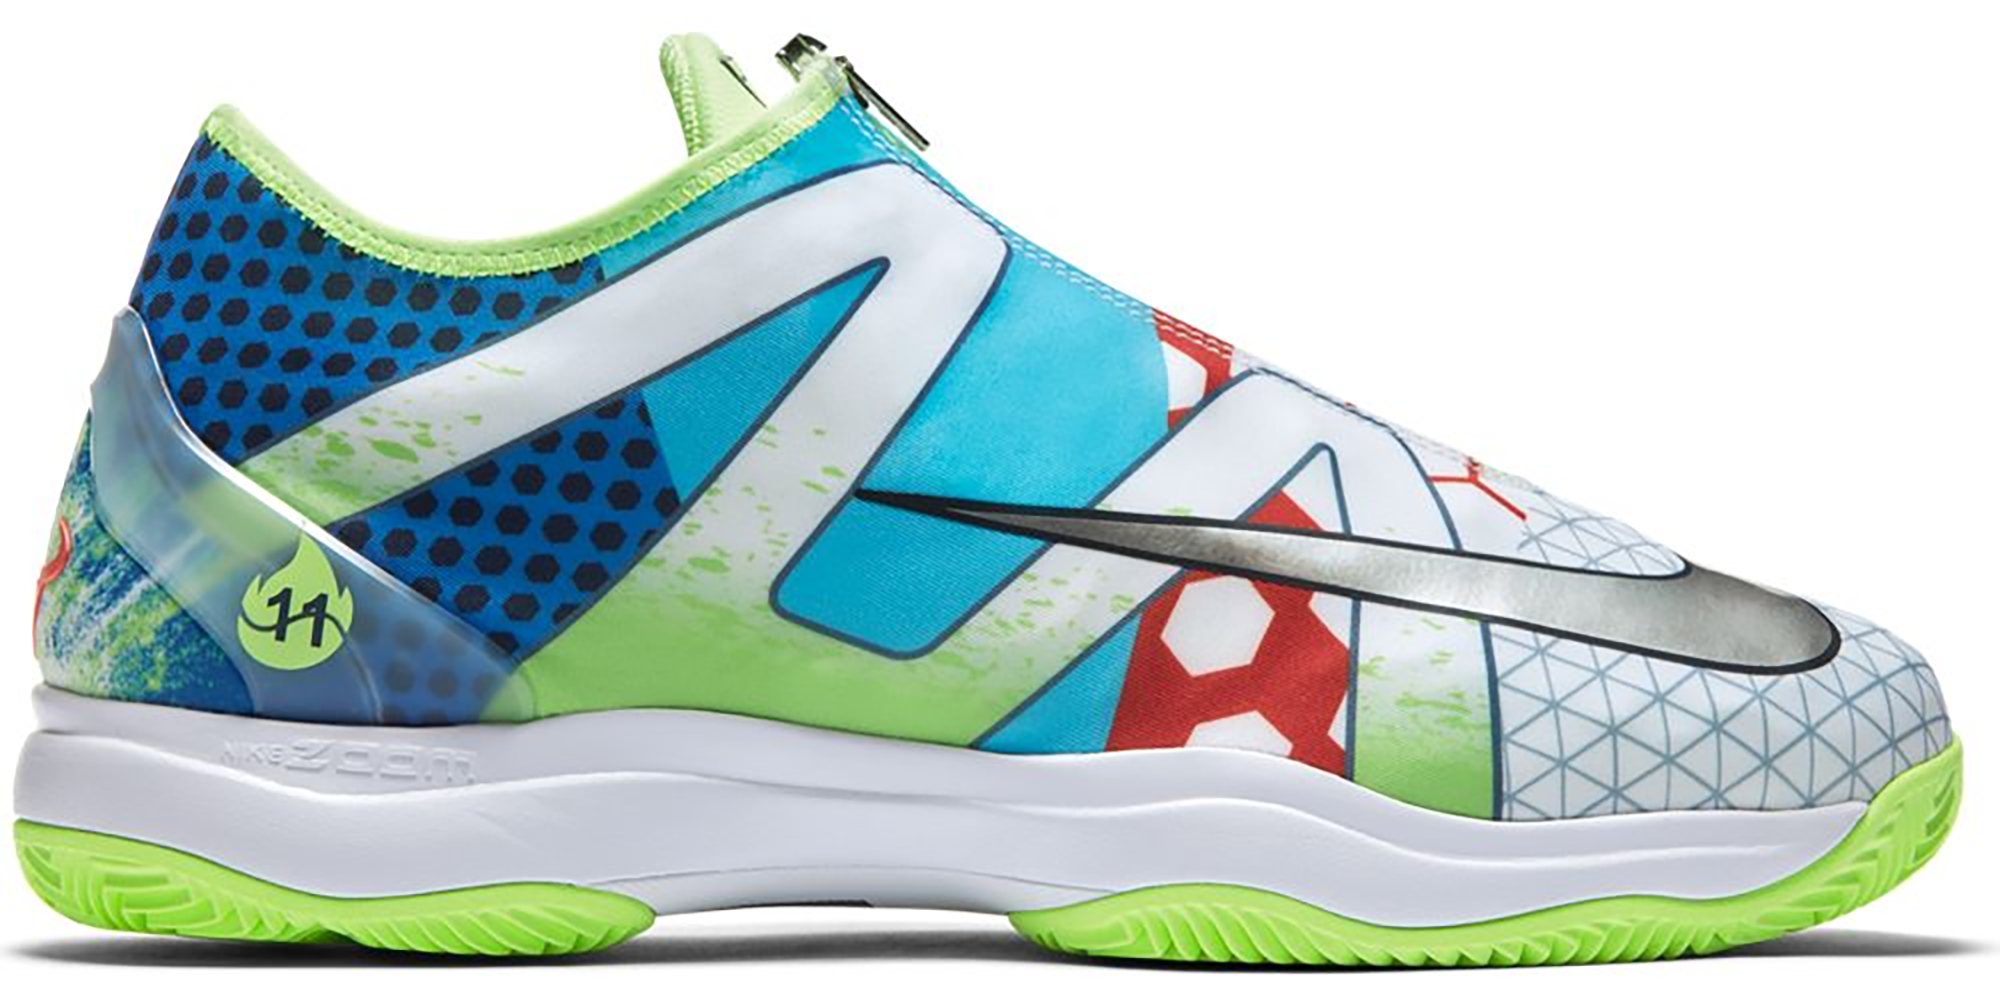 Nike Air Zoom Cage 3 Glove Rafael Nadal Roland Garros ...